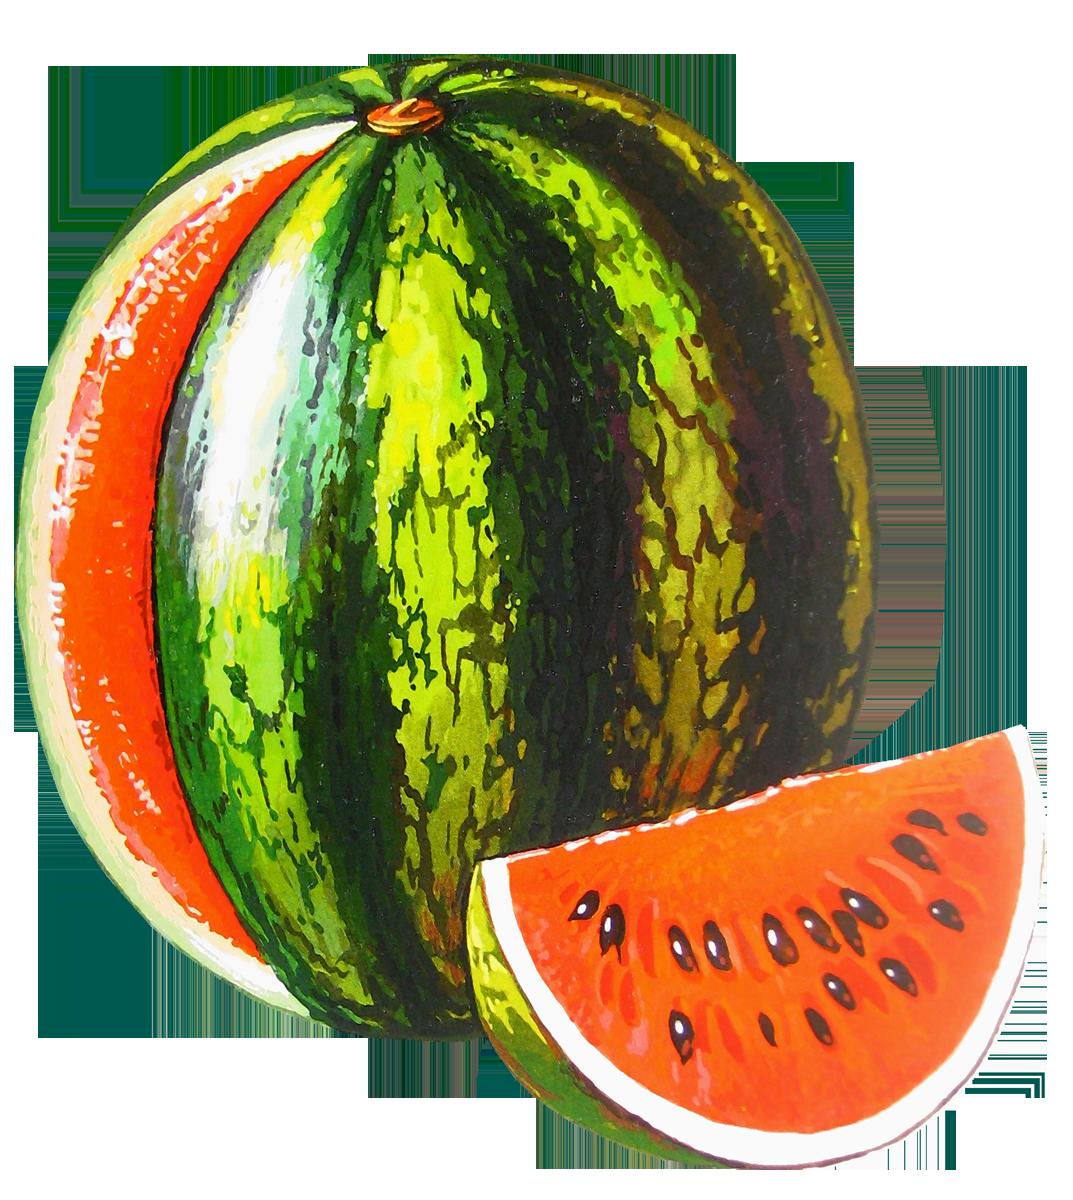 Watermelon Png Image Watermelon Fruit Photography Melon